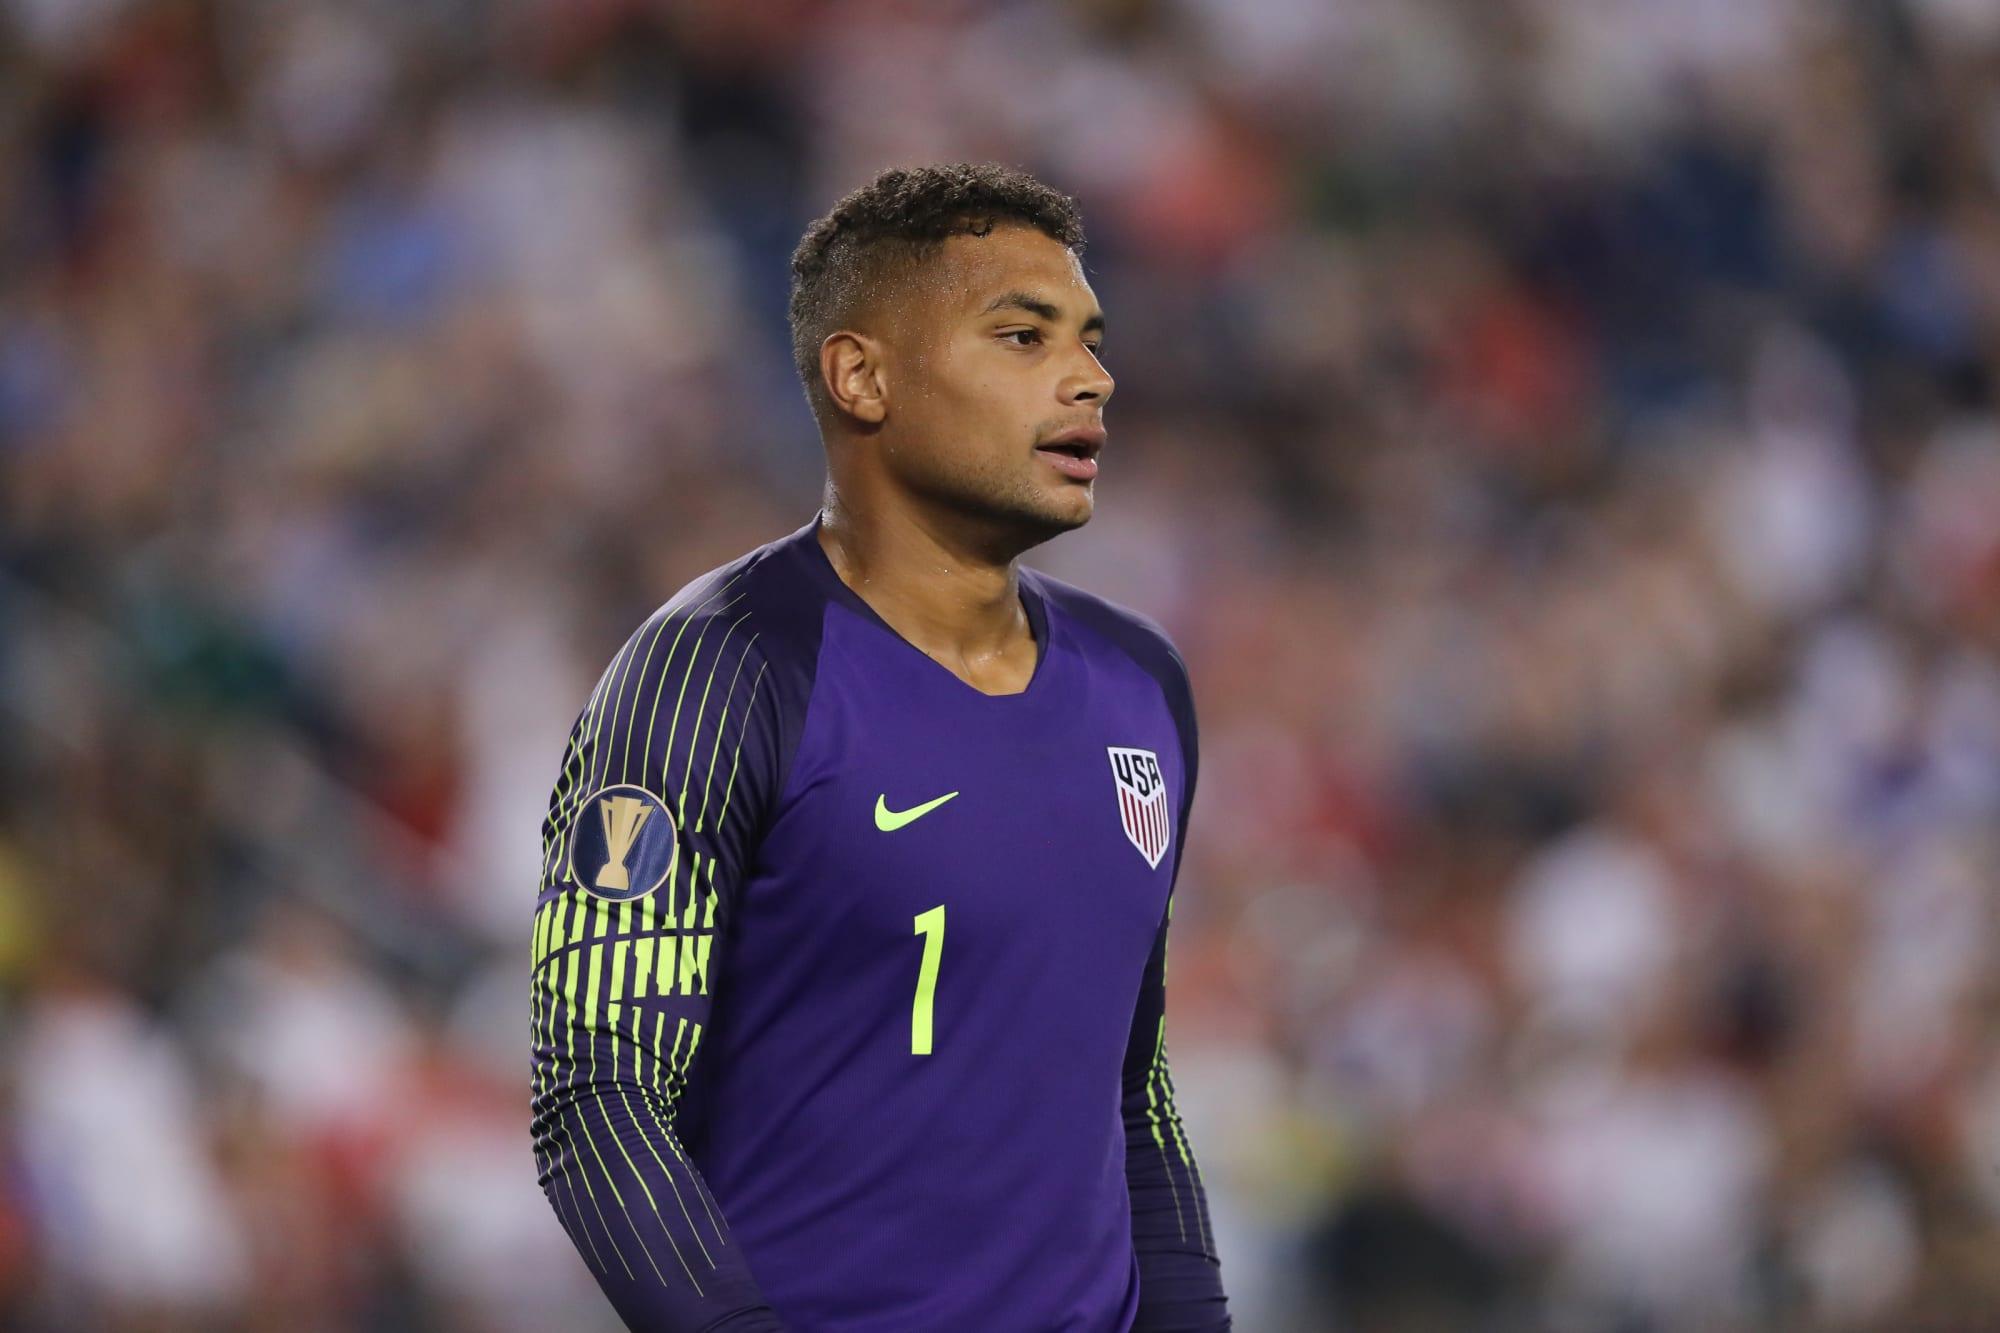 USMNT abroad: Zack Steffen return to Manchester City